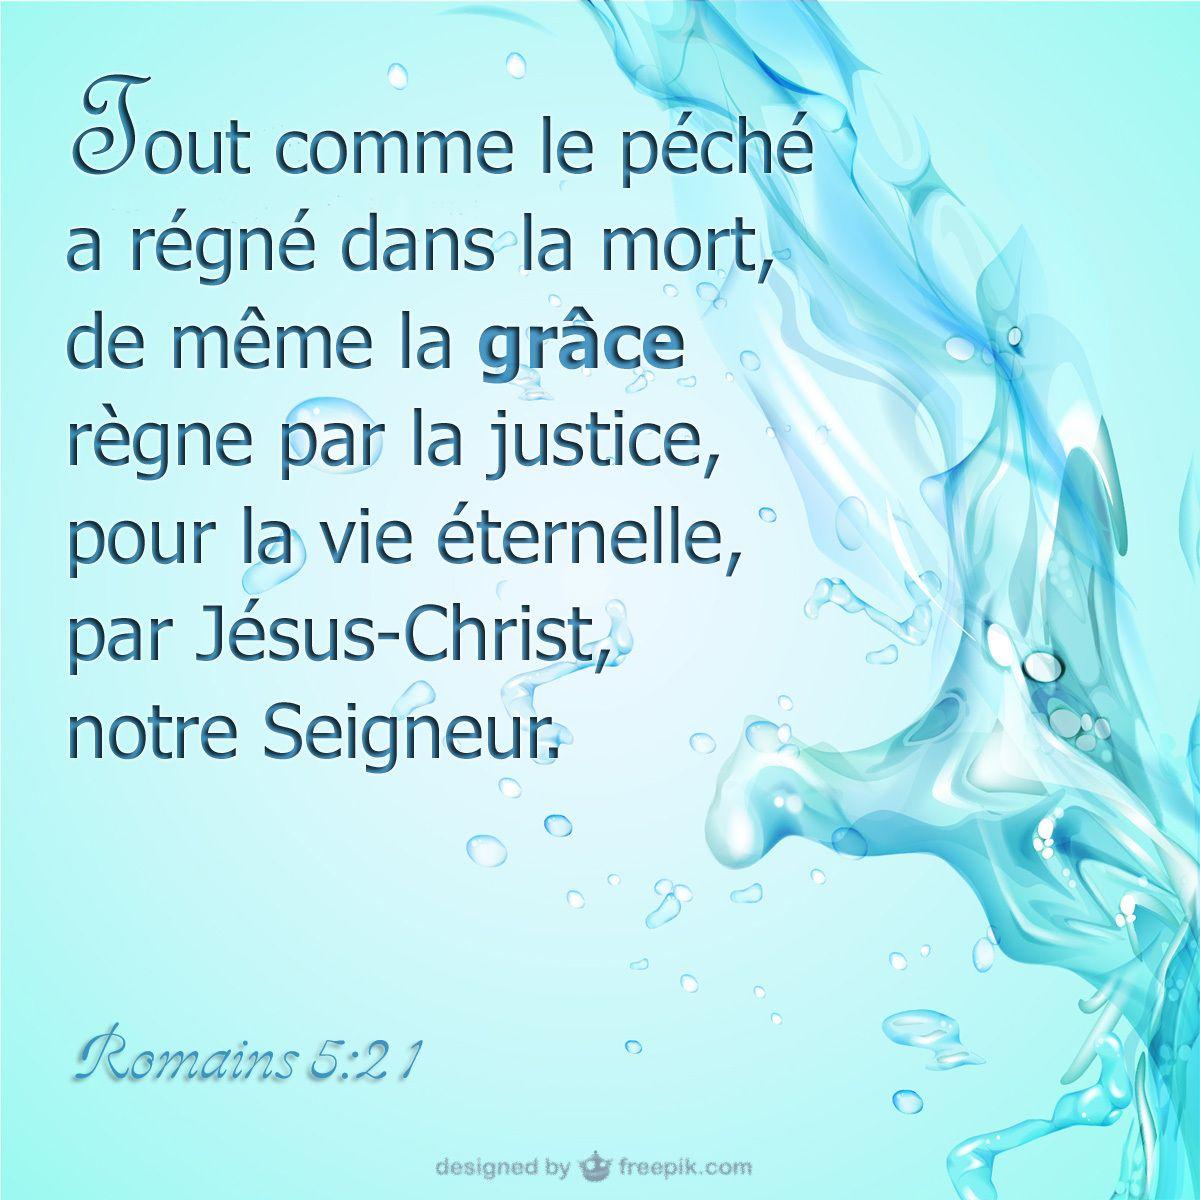 La Grace Regne Par La Justice Versets De La Bible Citations Bibliques Versets